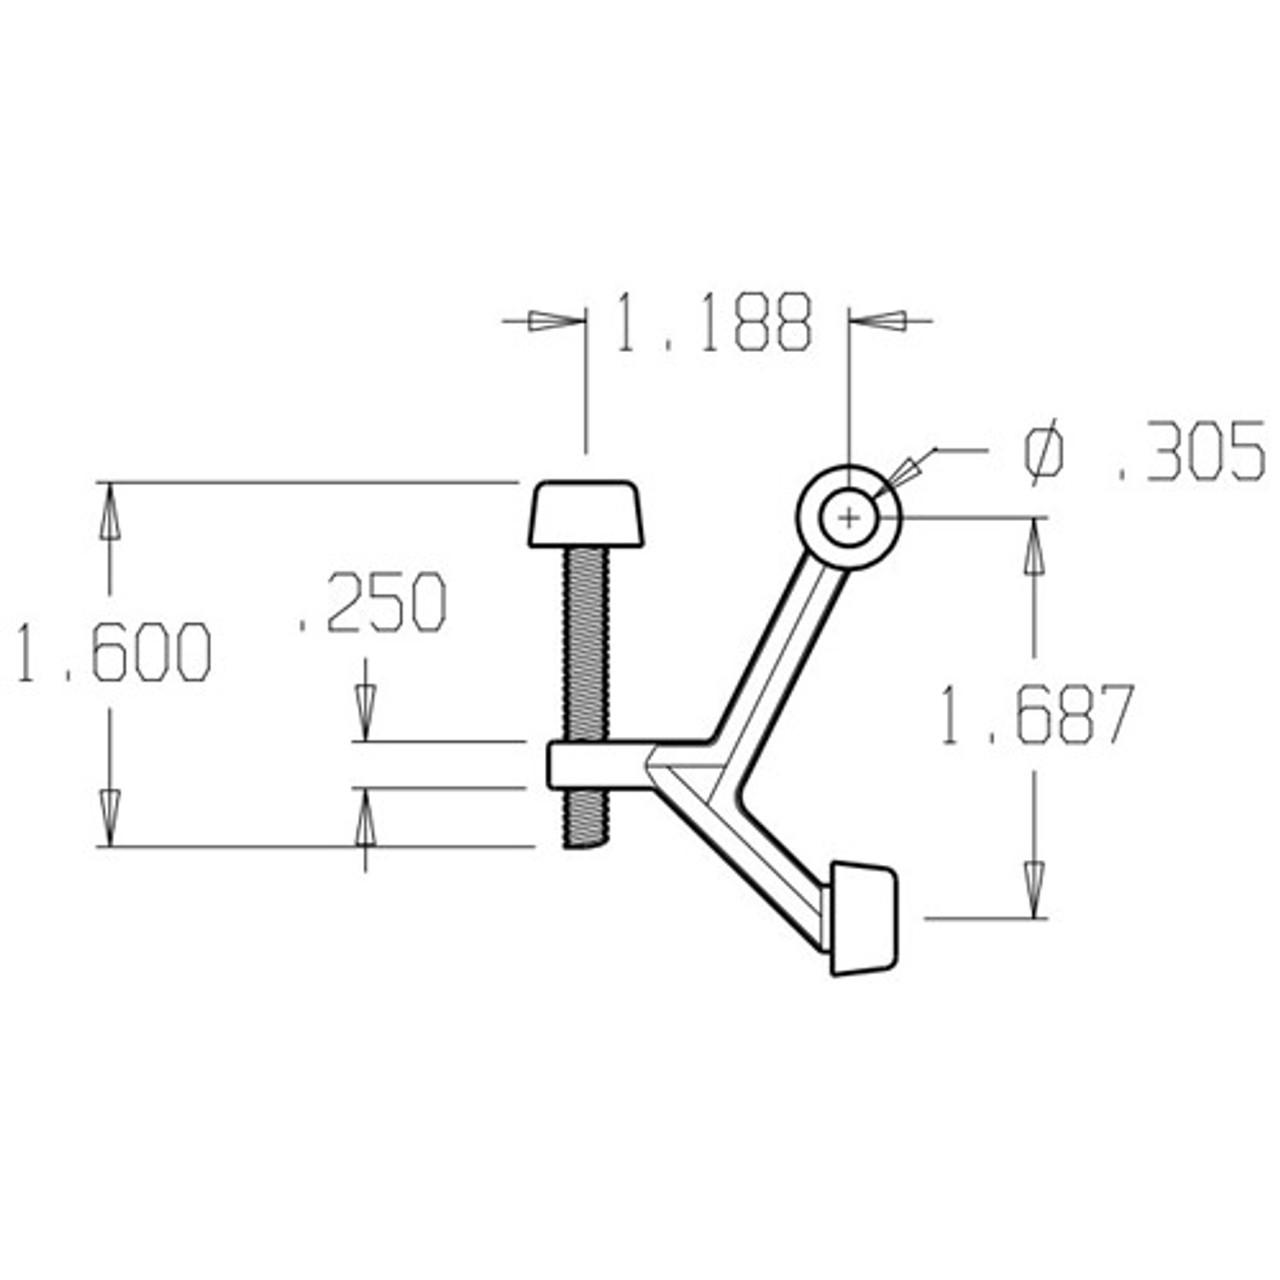 1500-605 Don Jo Hinge Stop Dimensional View